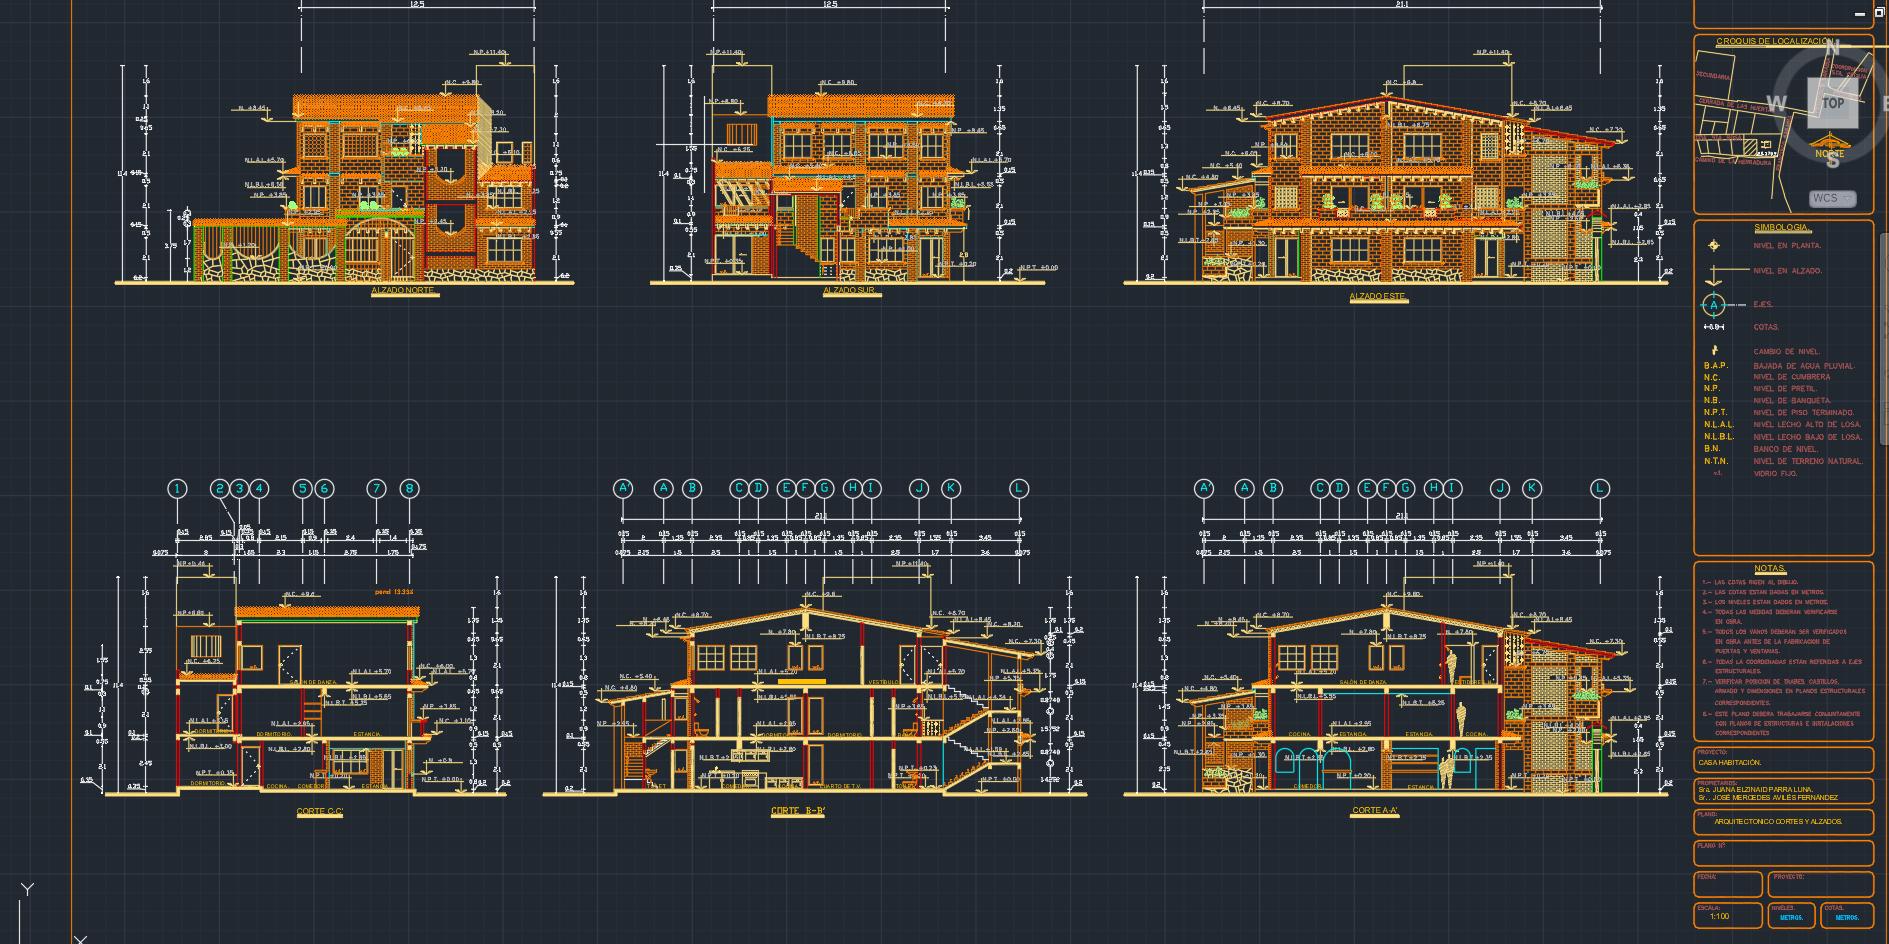 Descarga gratis planos de casa constructivos y detalles for Niveles en planos arquitectonicos